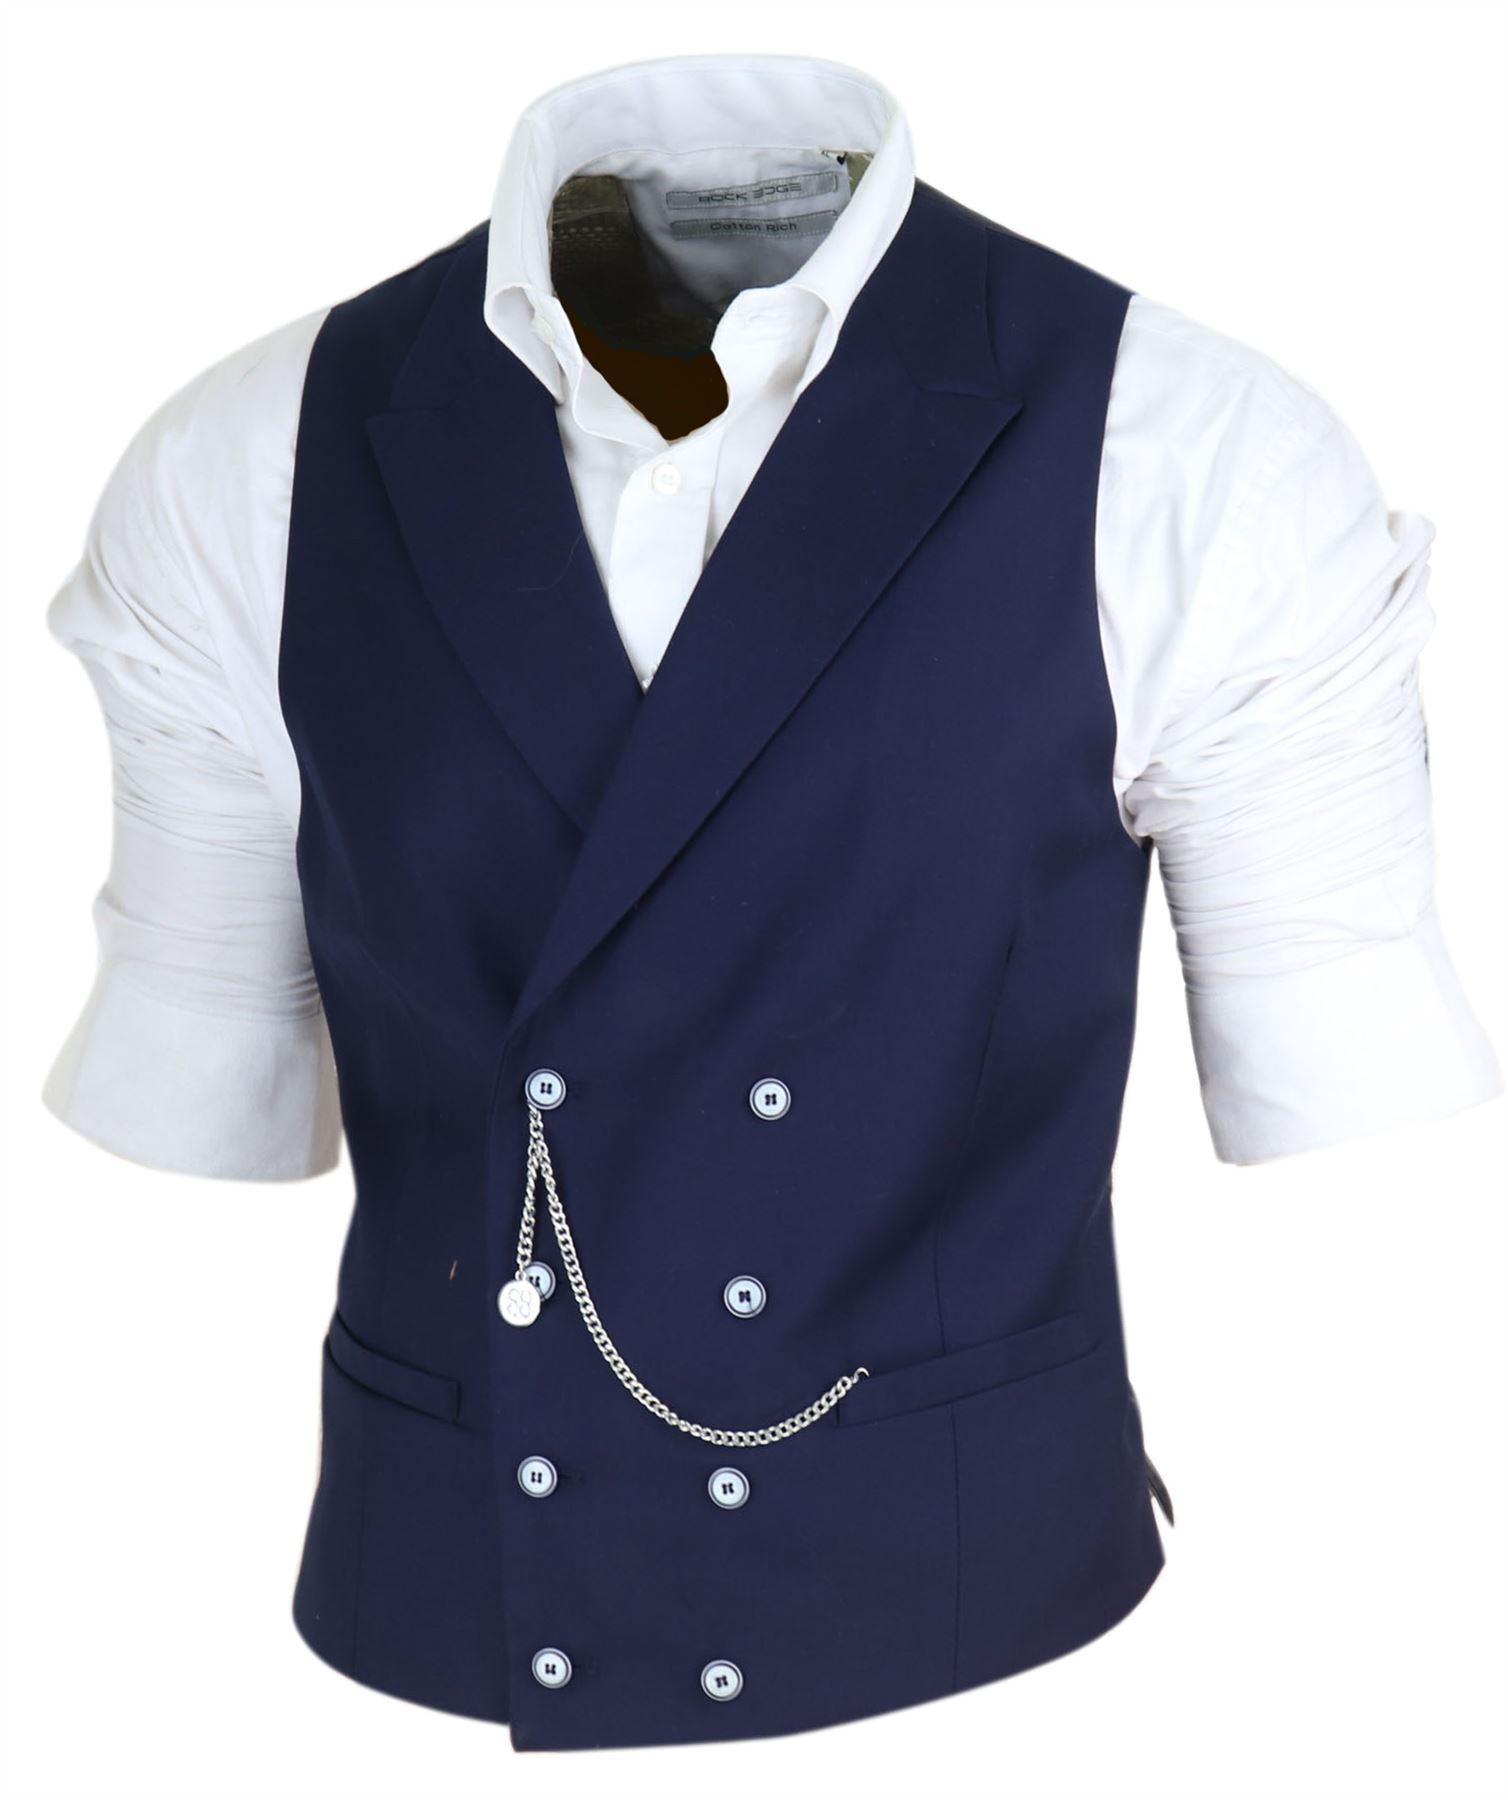 House Of Cavani Mens Double Breasted Waistcoat 1920s Peaky Blinders Smart Casual Pocket Chain